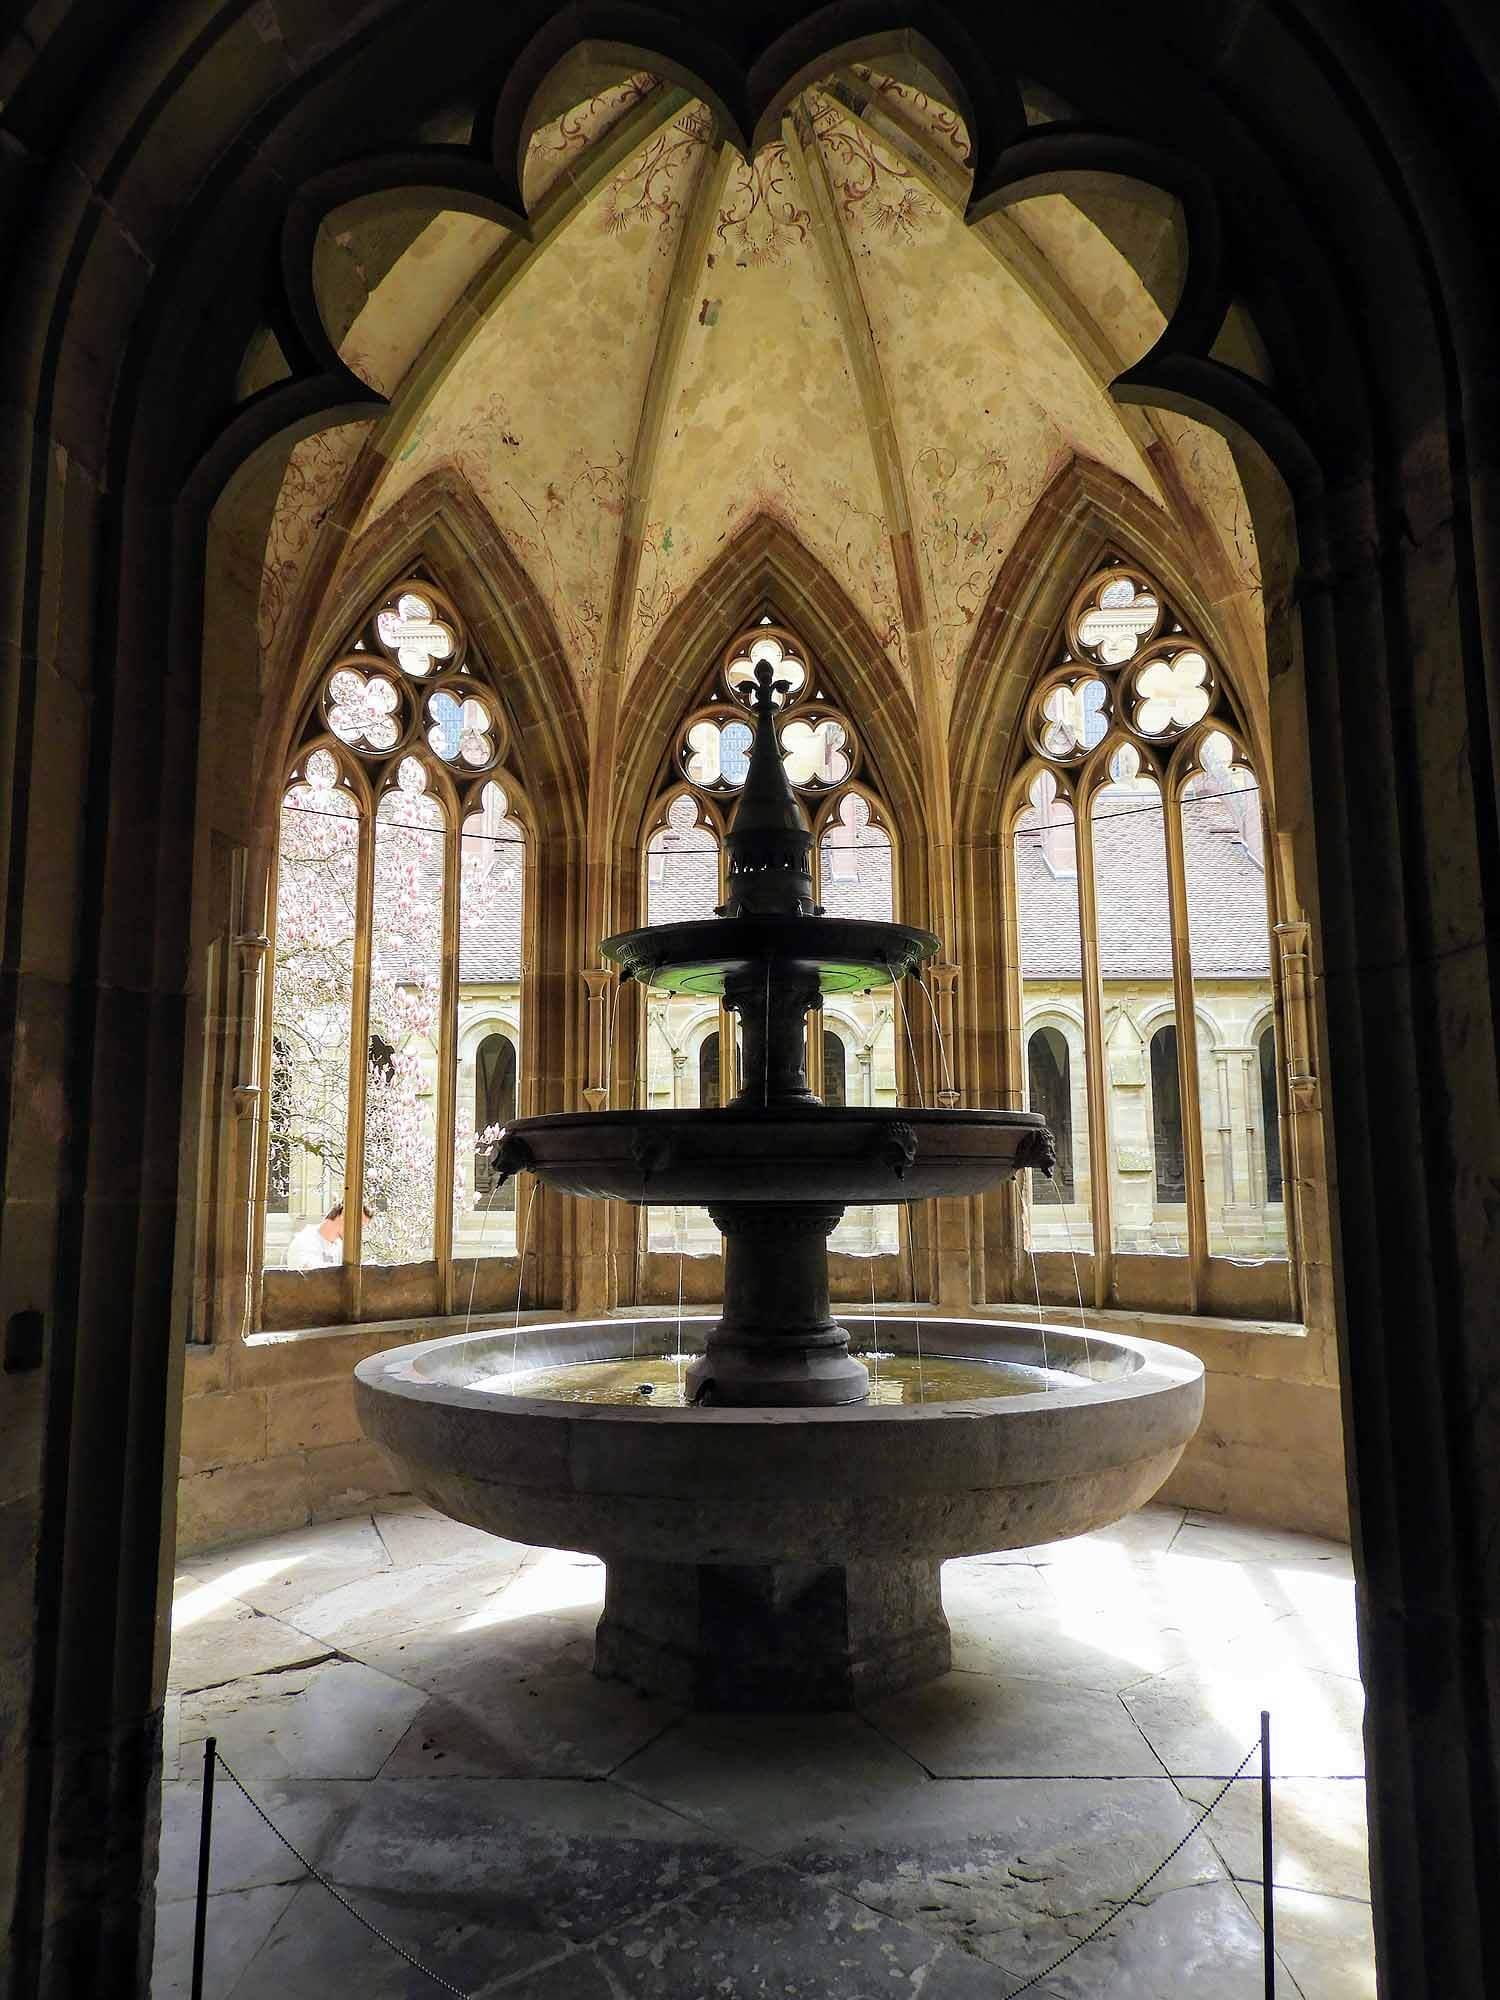 germany-kloster-maulbronn-fountain-water-health-monks.jpg